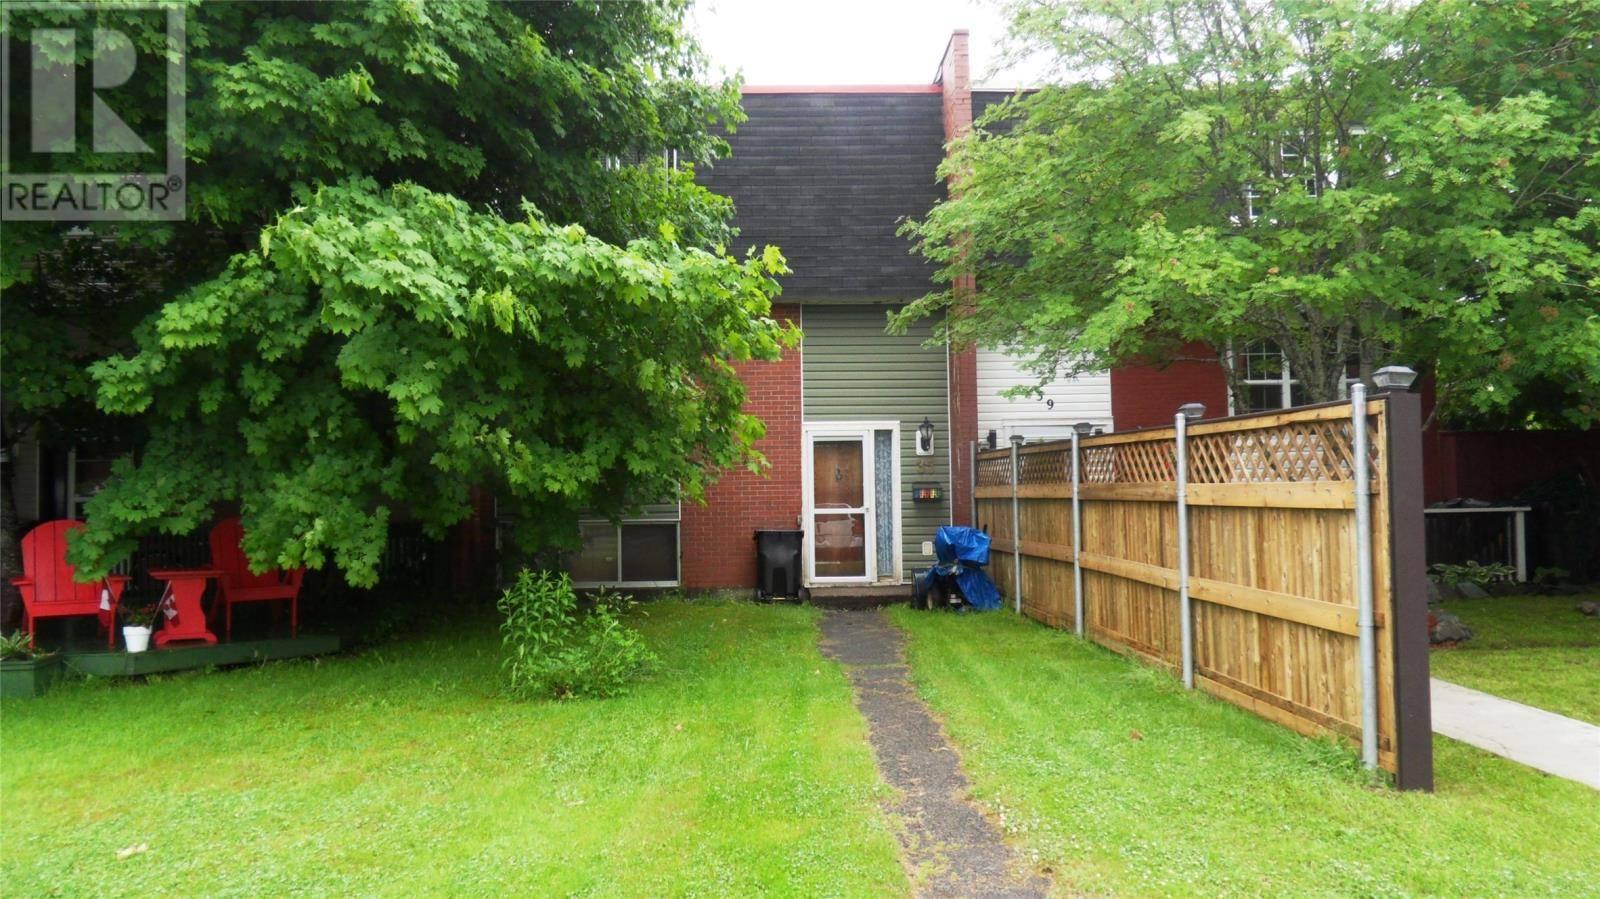 House for sale at 35 Doyle St St. John's Newfoundland - MLS: 1199329